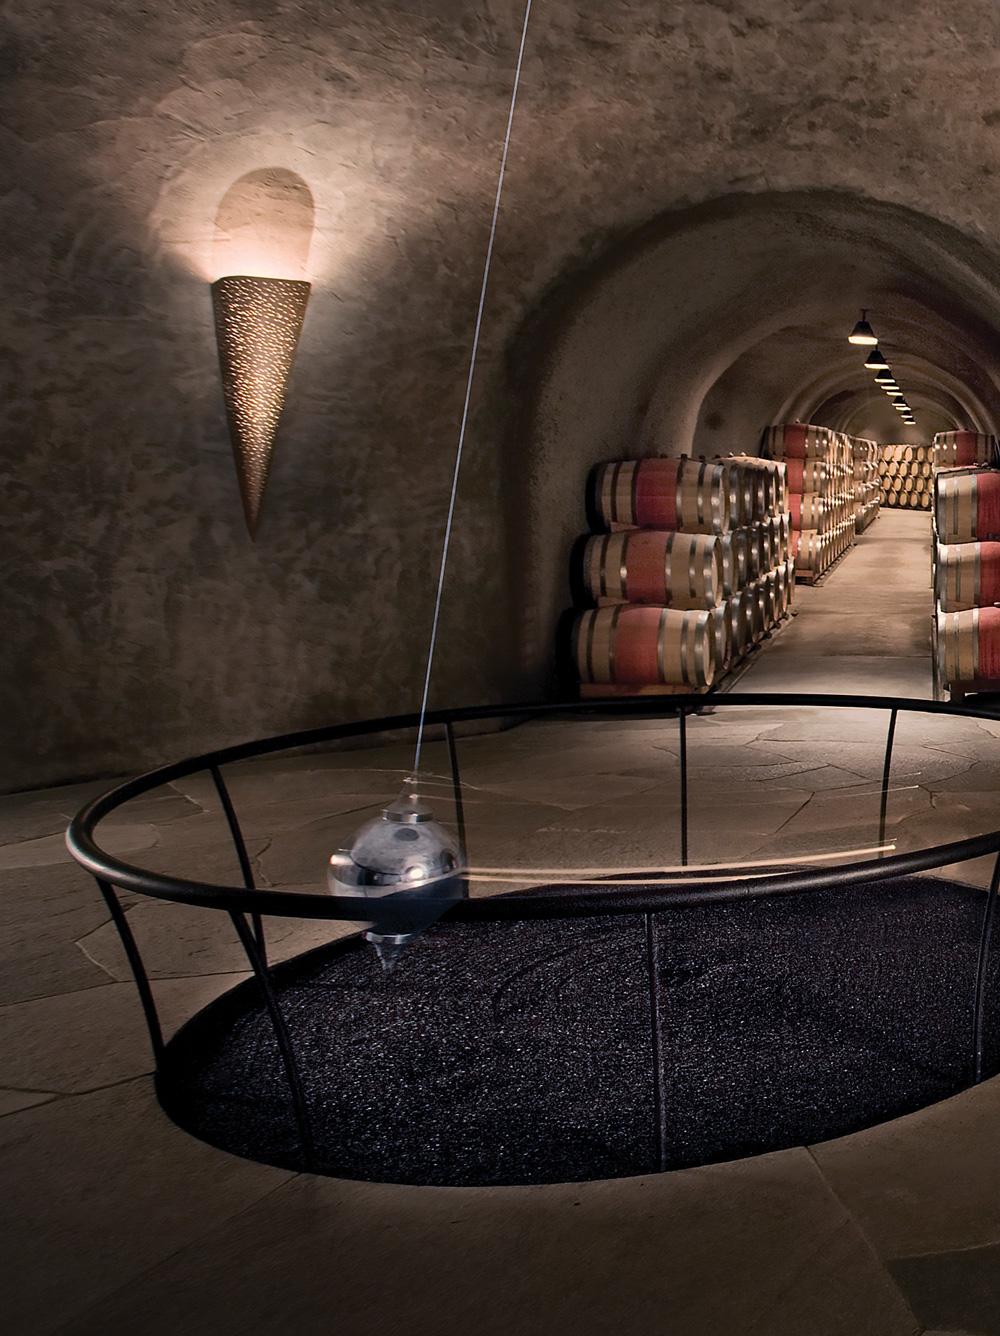 The Foucault pendulum at Stag's Leap Wine Cellars